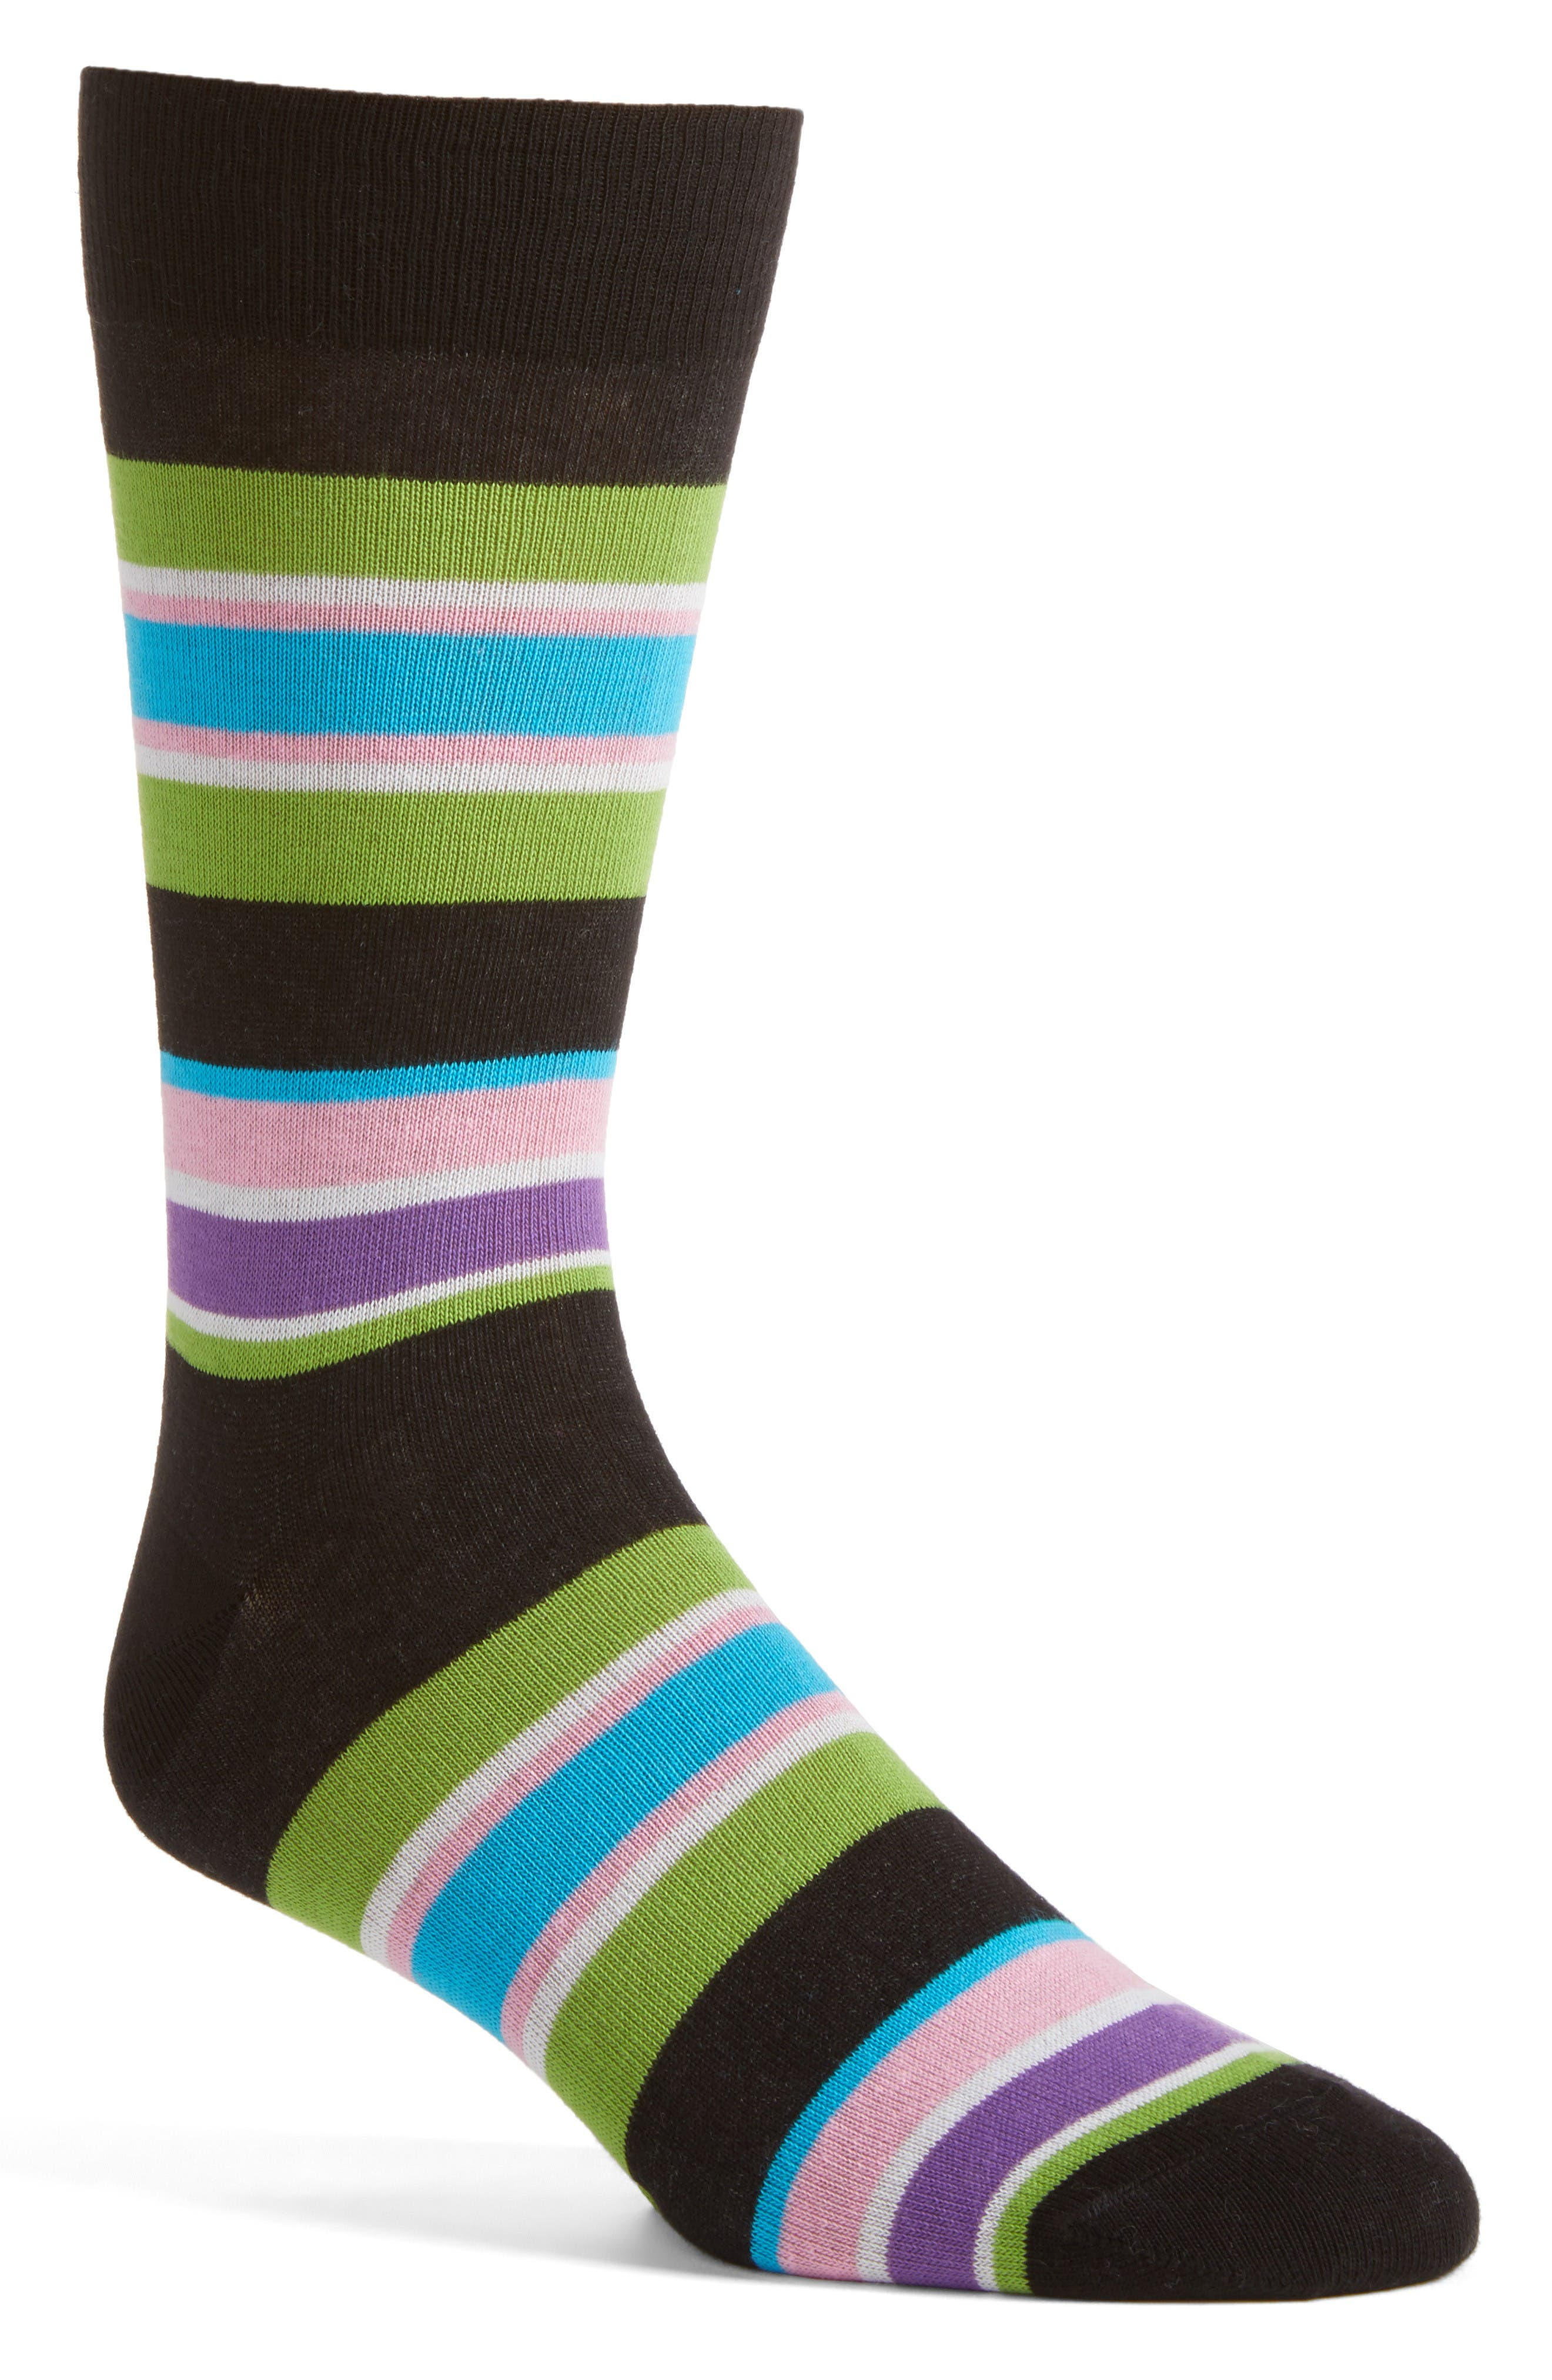 Lorenzo Uomo Rugby Block Stripe Crew Socks